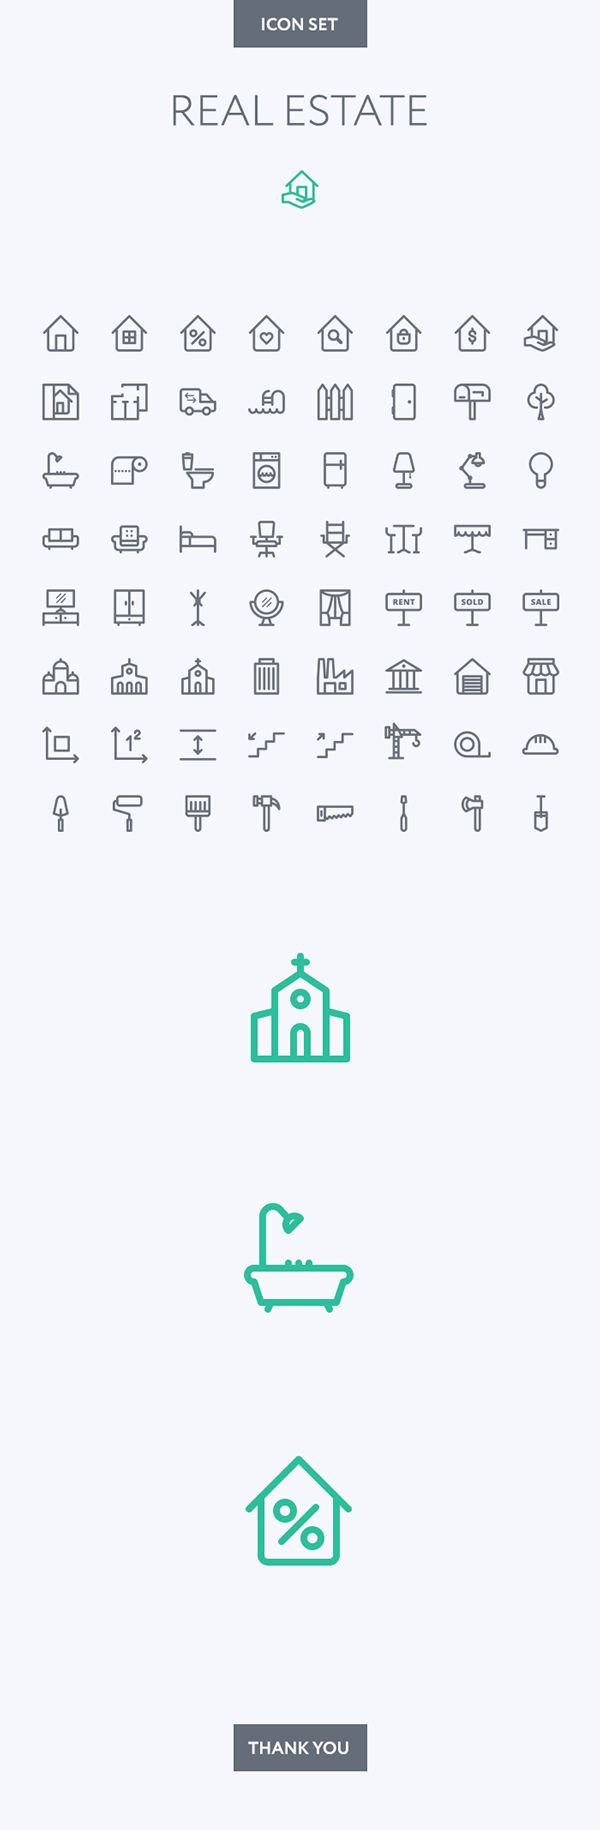 Real Estate icon set by Dmitriy Miroliubov, via Behance